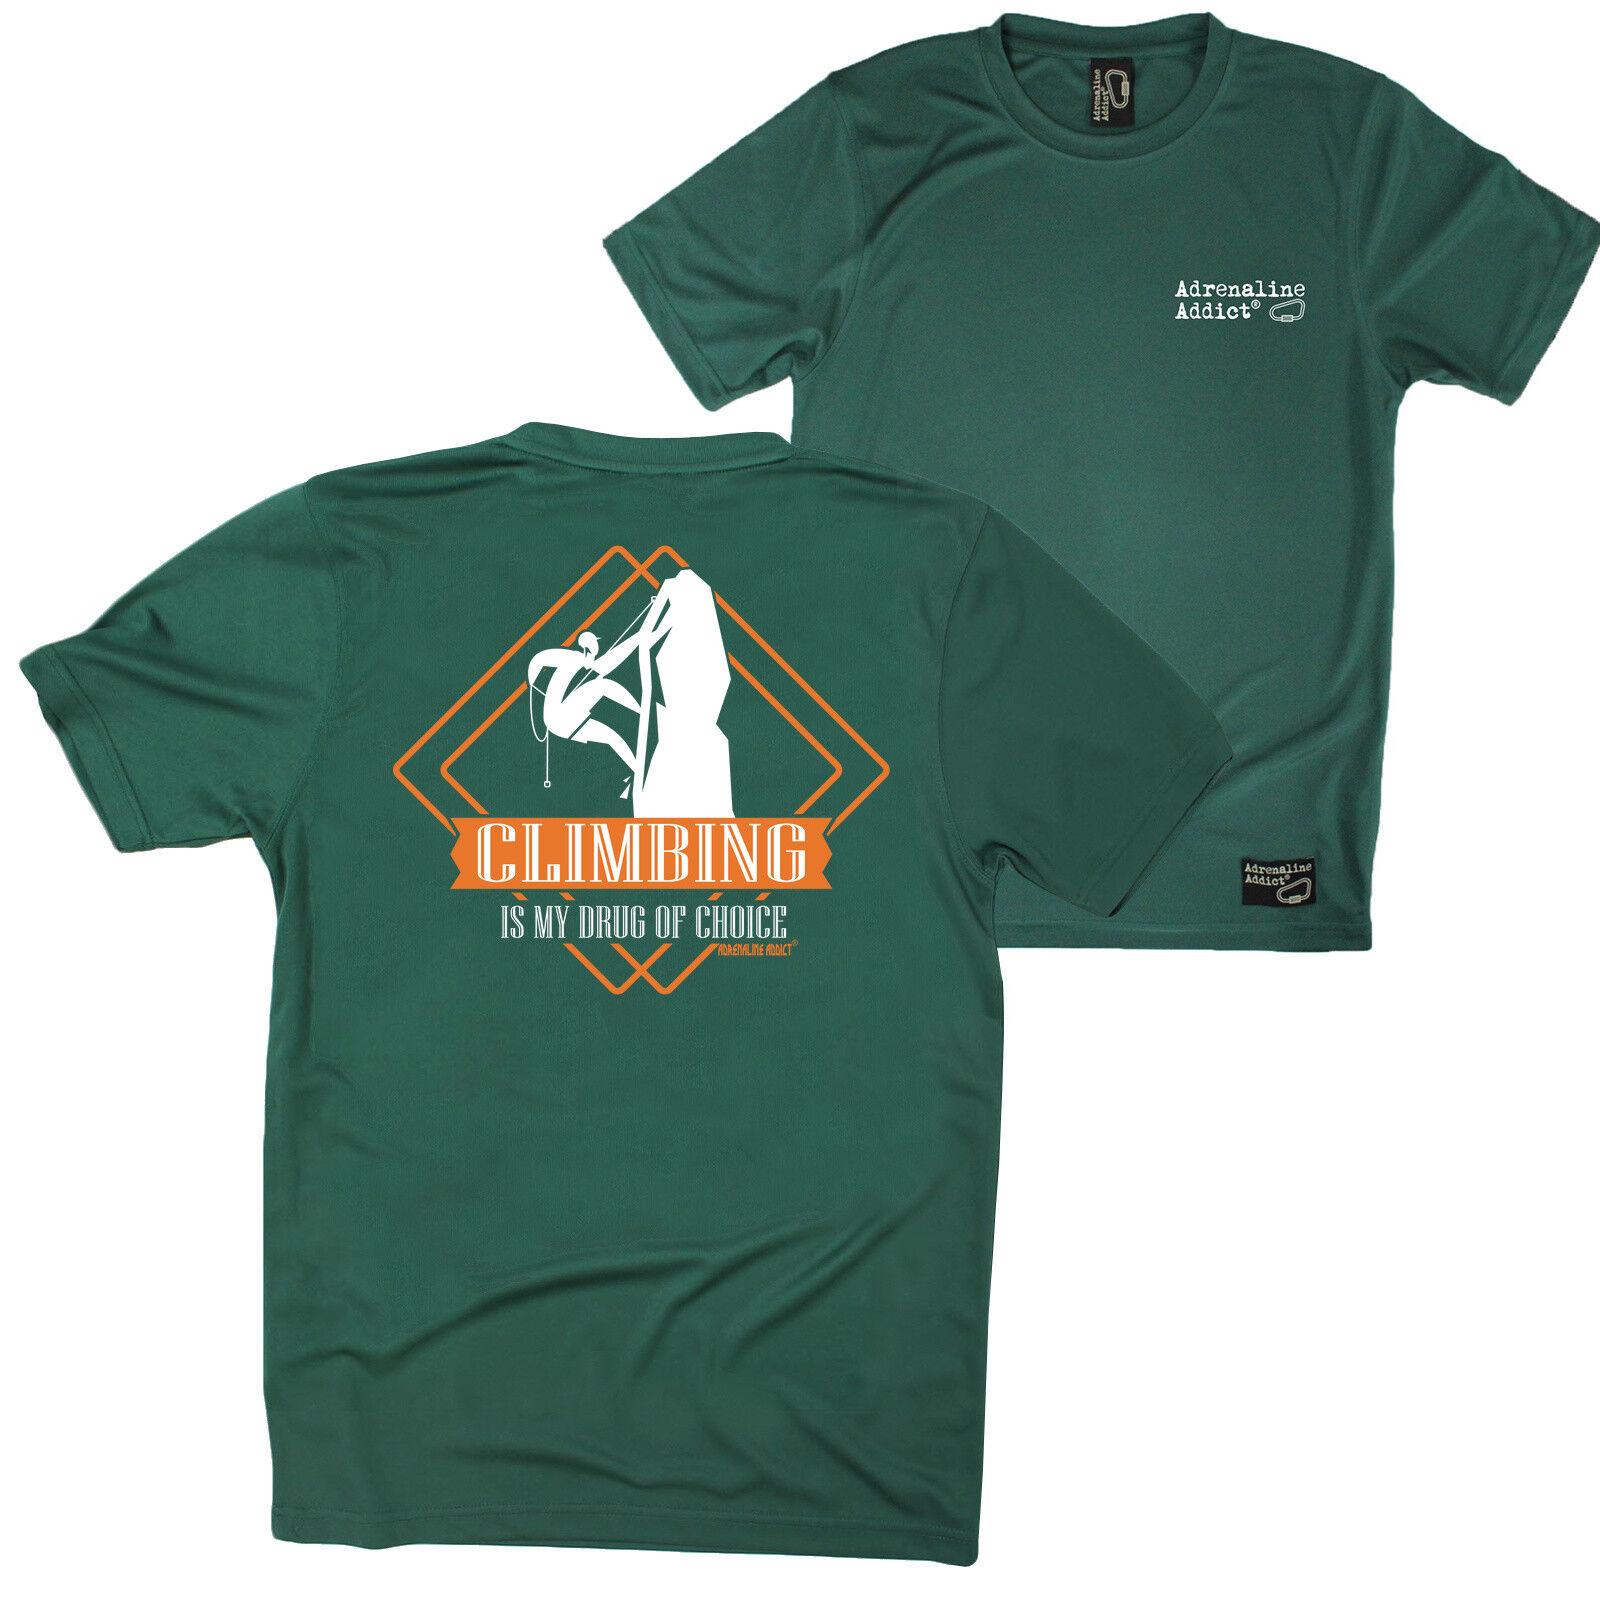 FB Rock Climbing Tee - Drug Of Choice Climbing - Dry Fit Performance T-Shirt